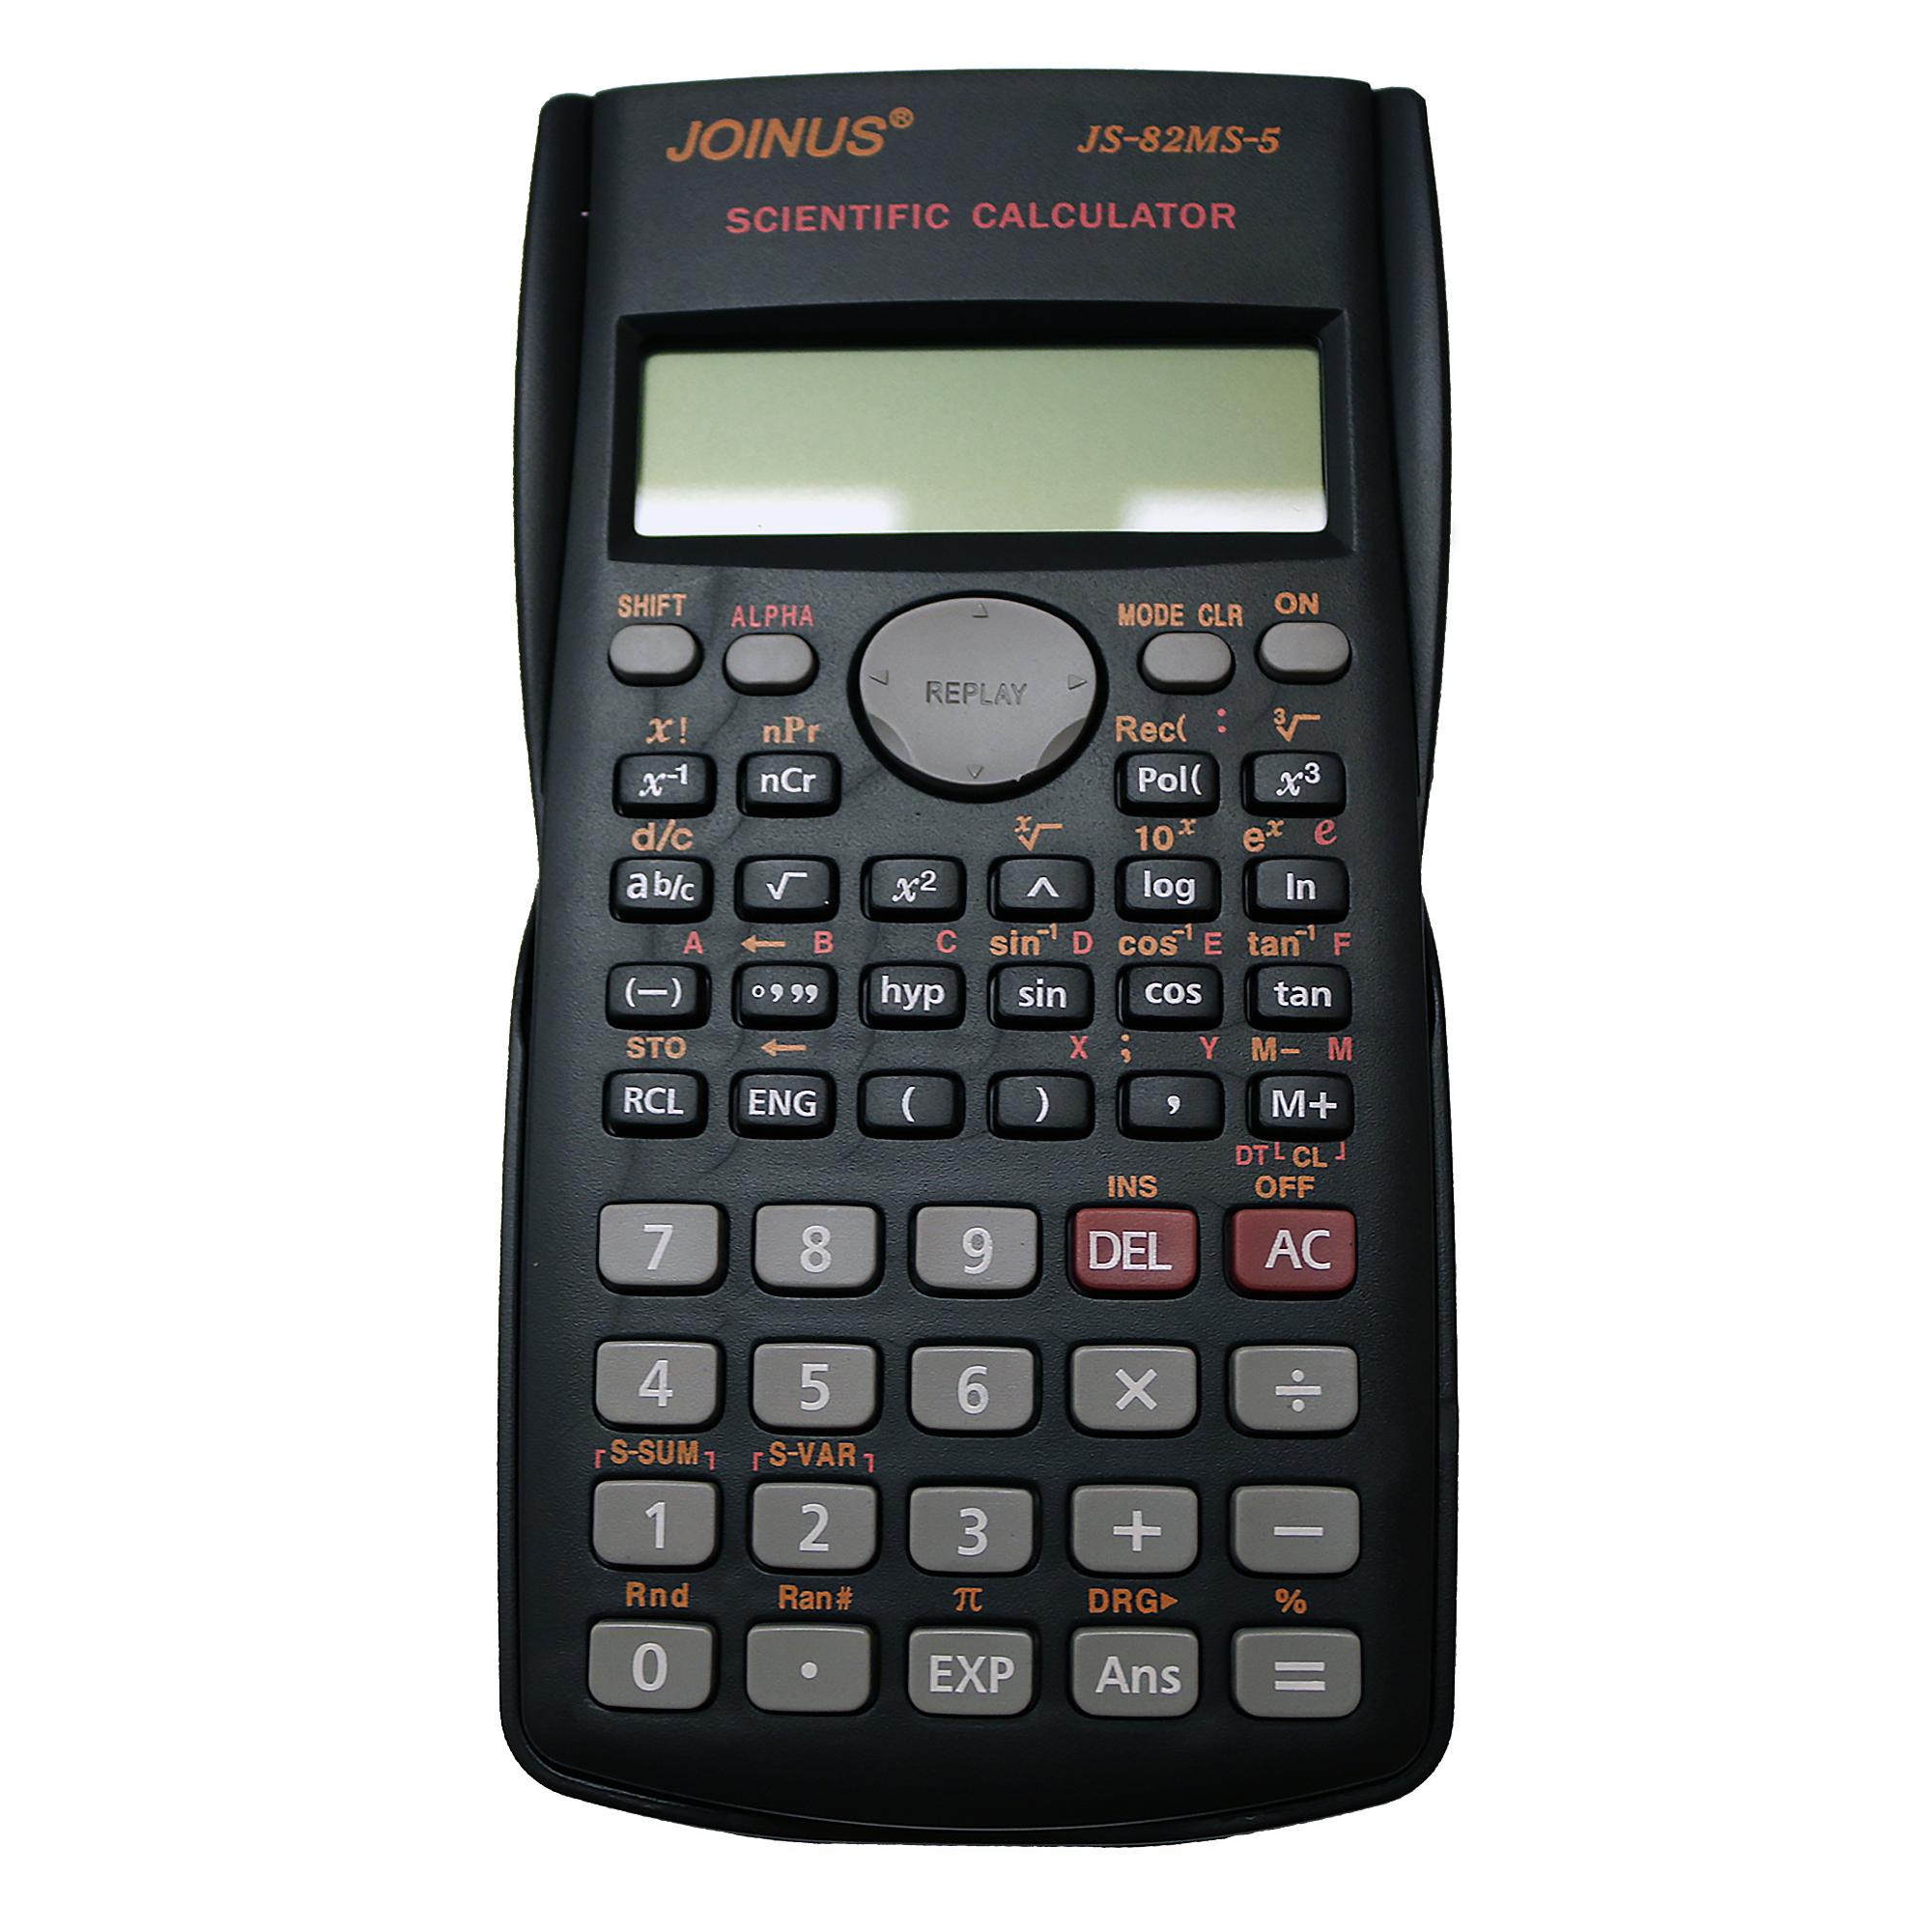 ماشین حساب جویناس مدل JS-82MS-5